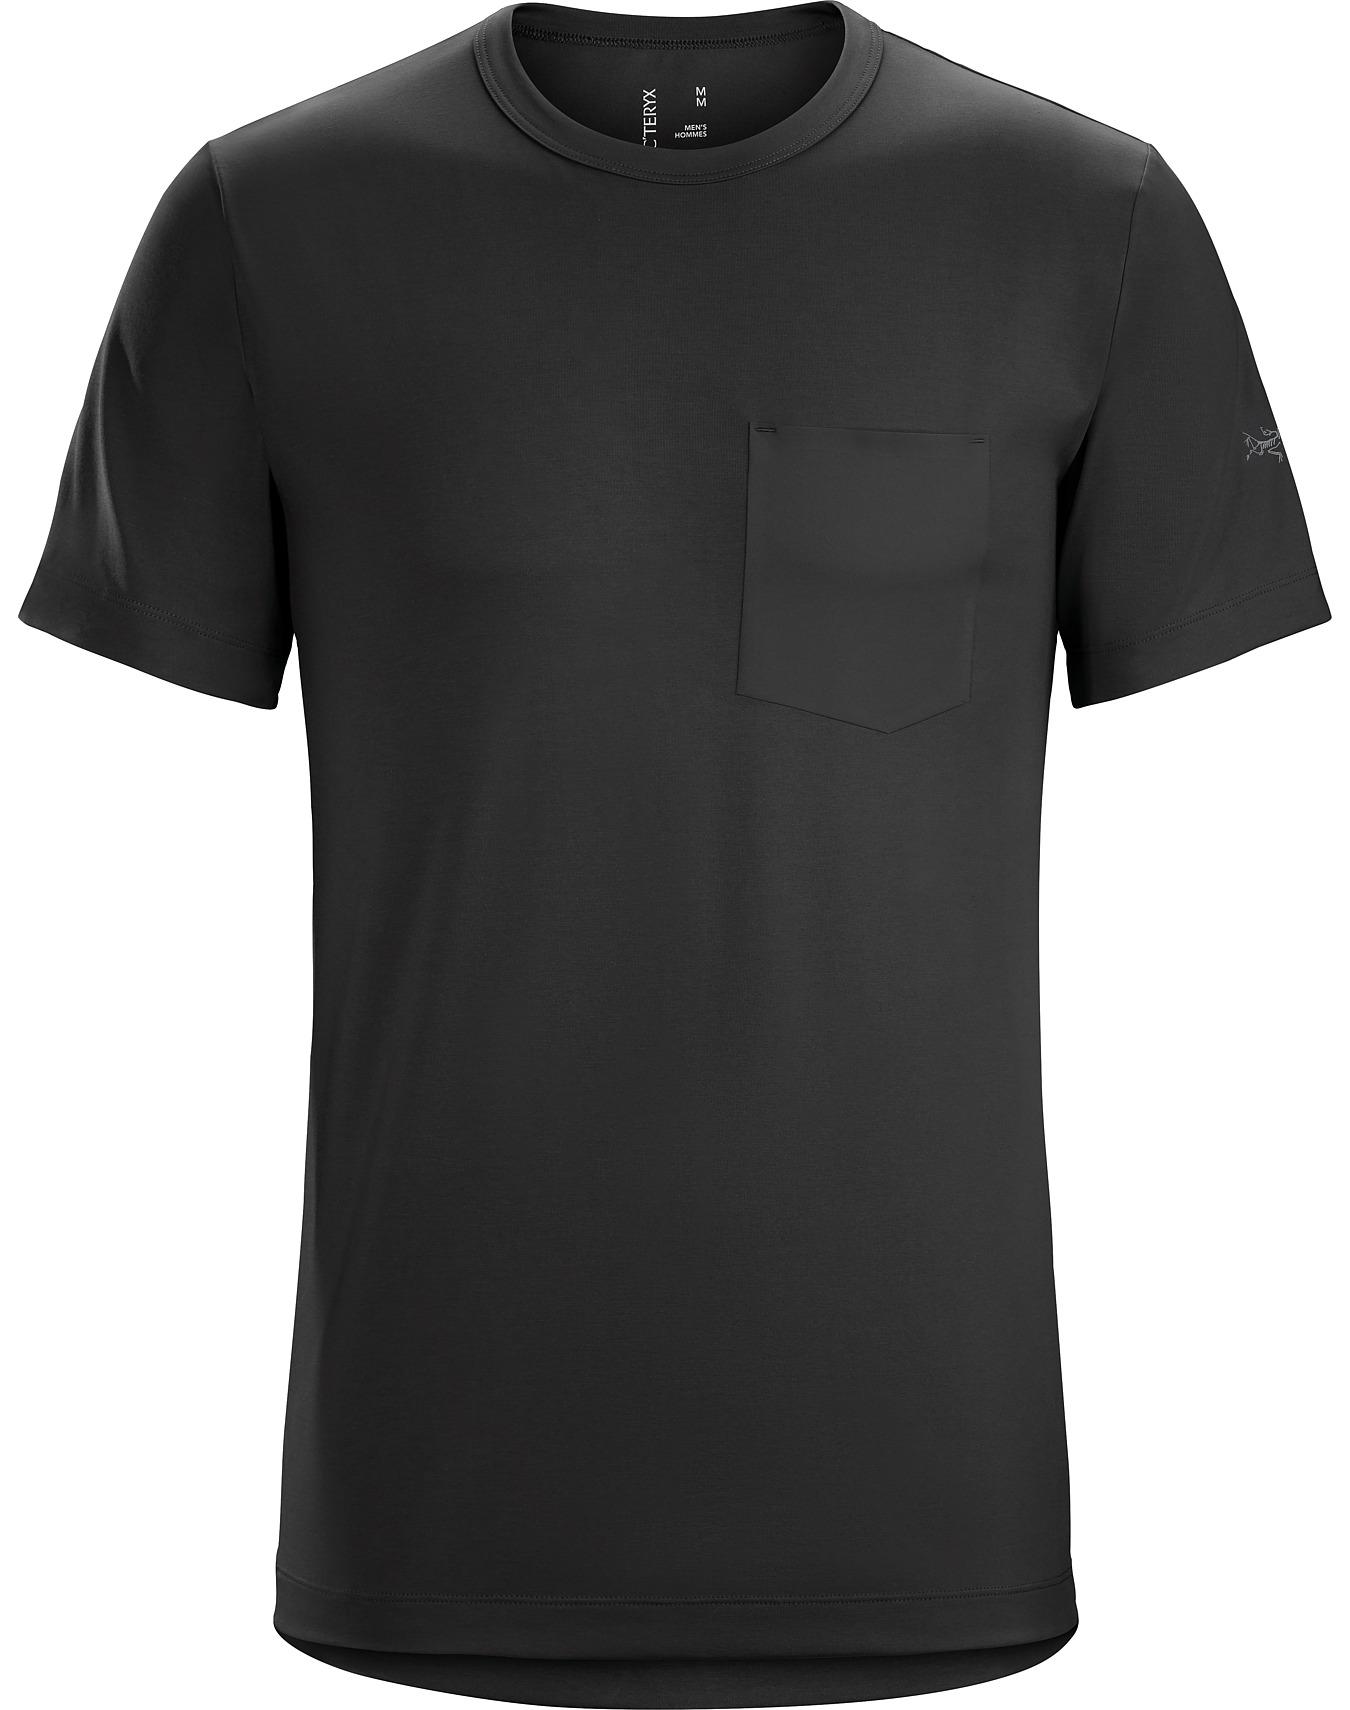 Anzo-T-Shirt-Black.jpg